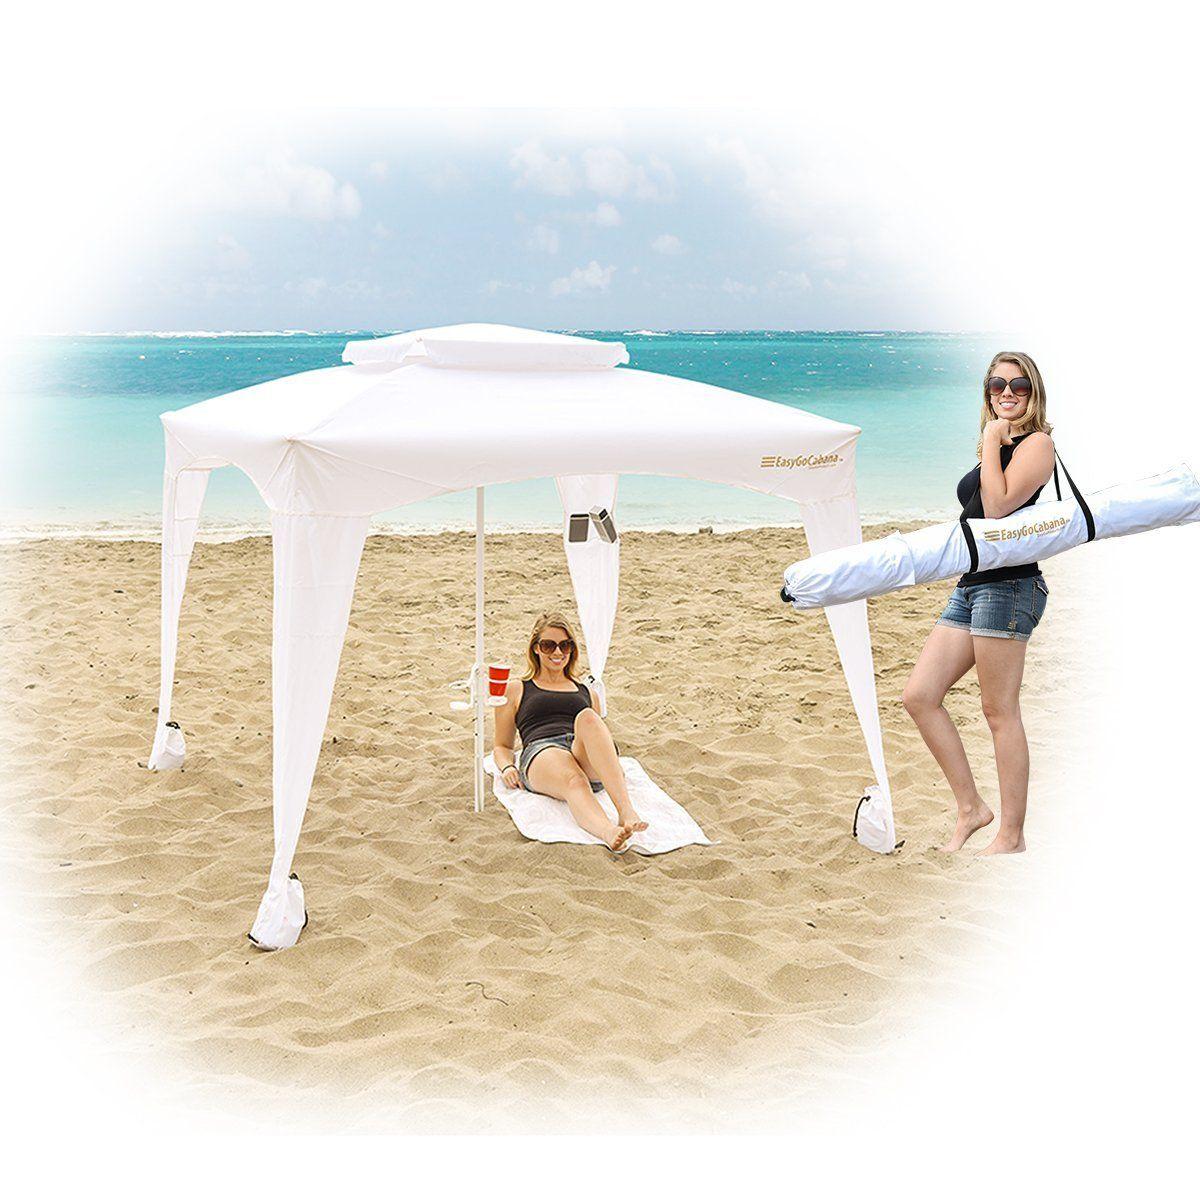 Easygo Cabana Beach And Sports